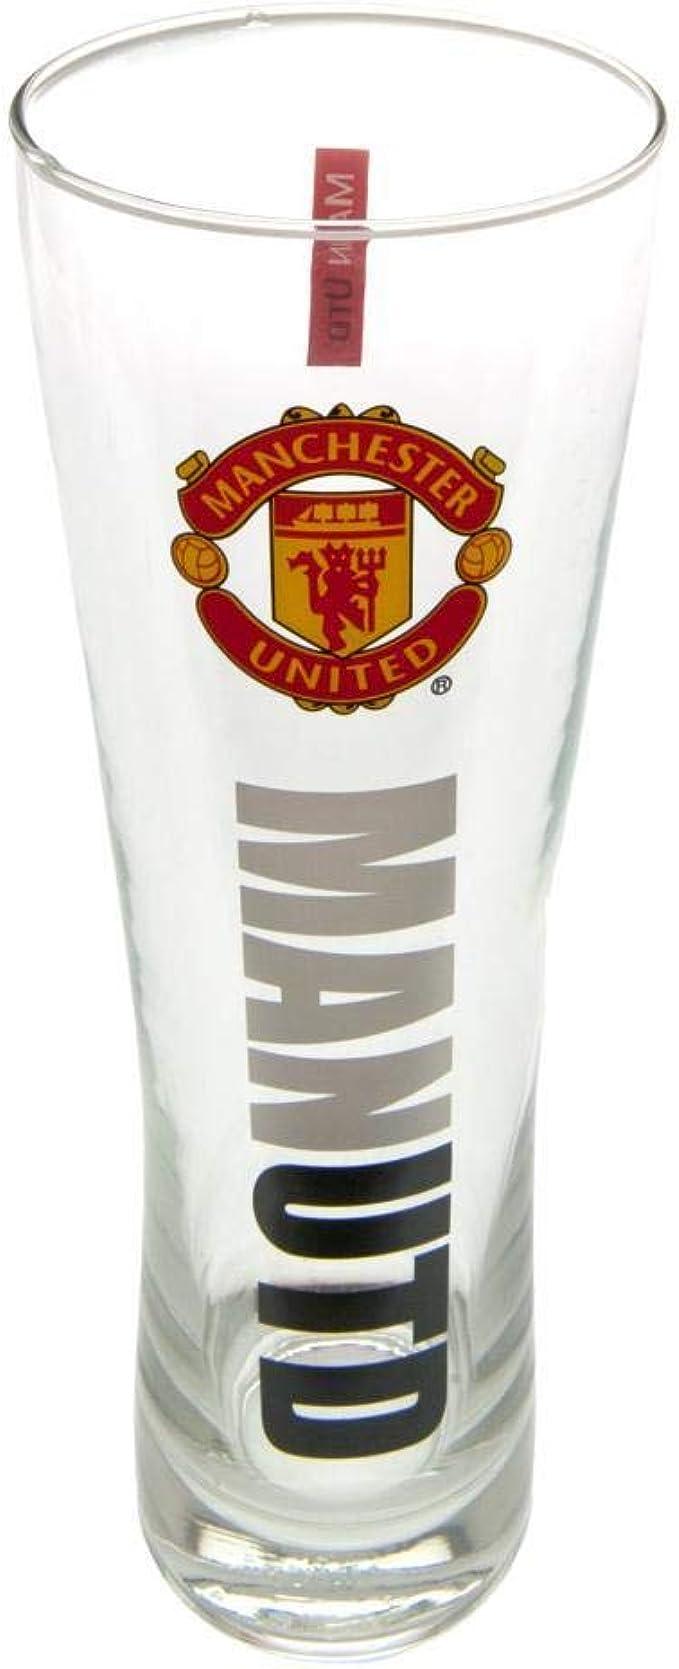 Manchester United Wordmark Crest Peroni Pint Glass